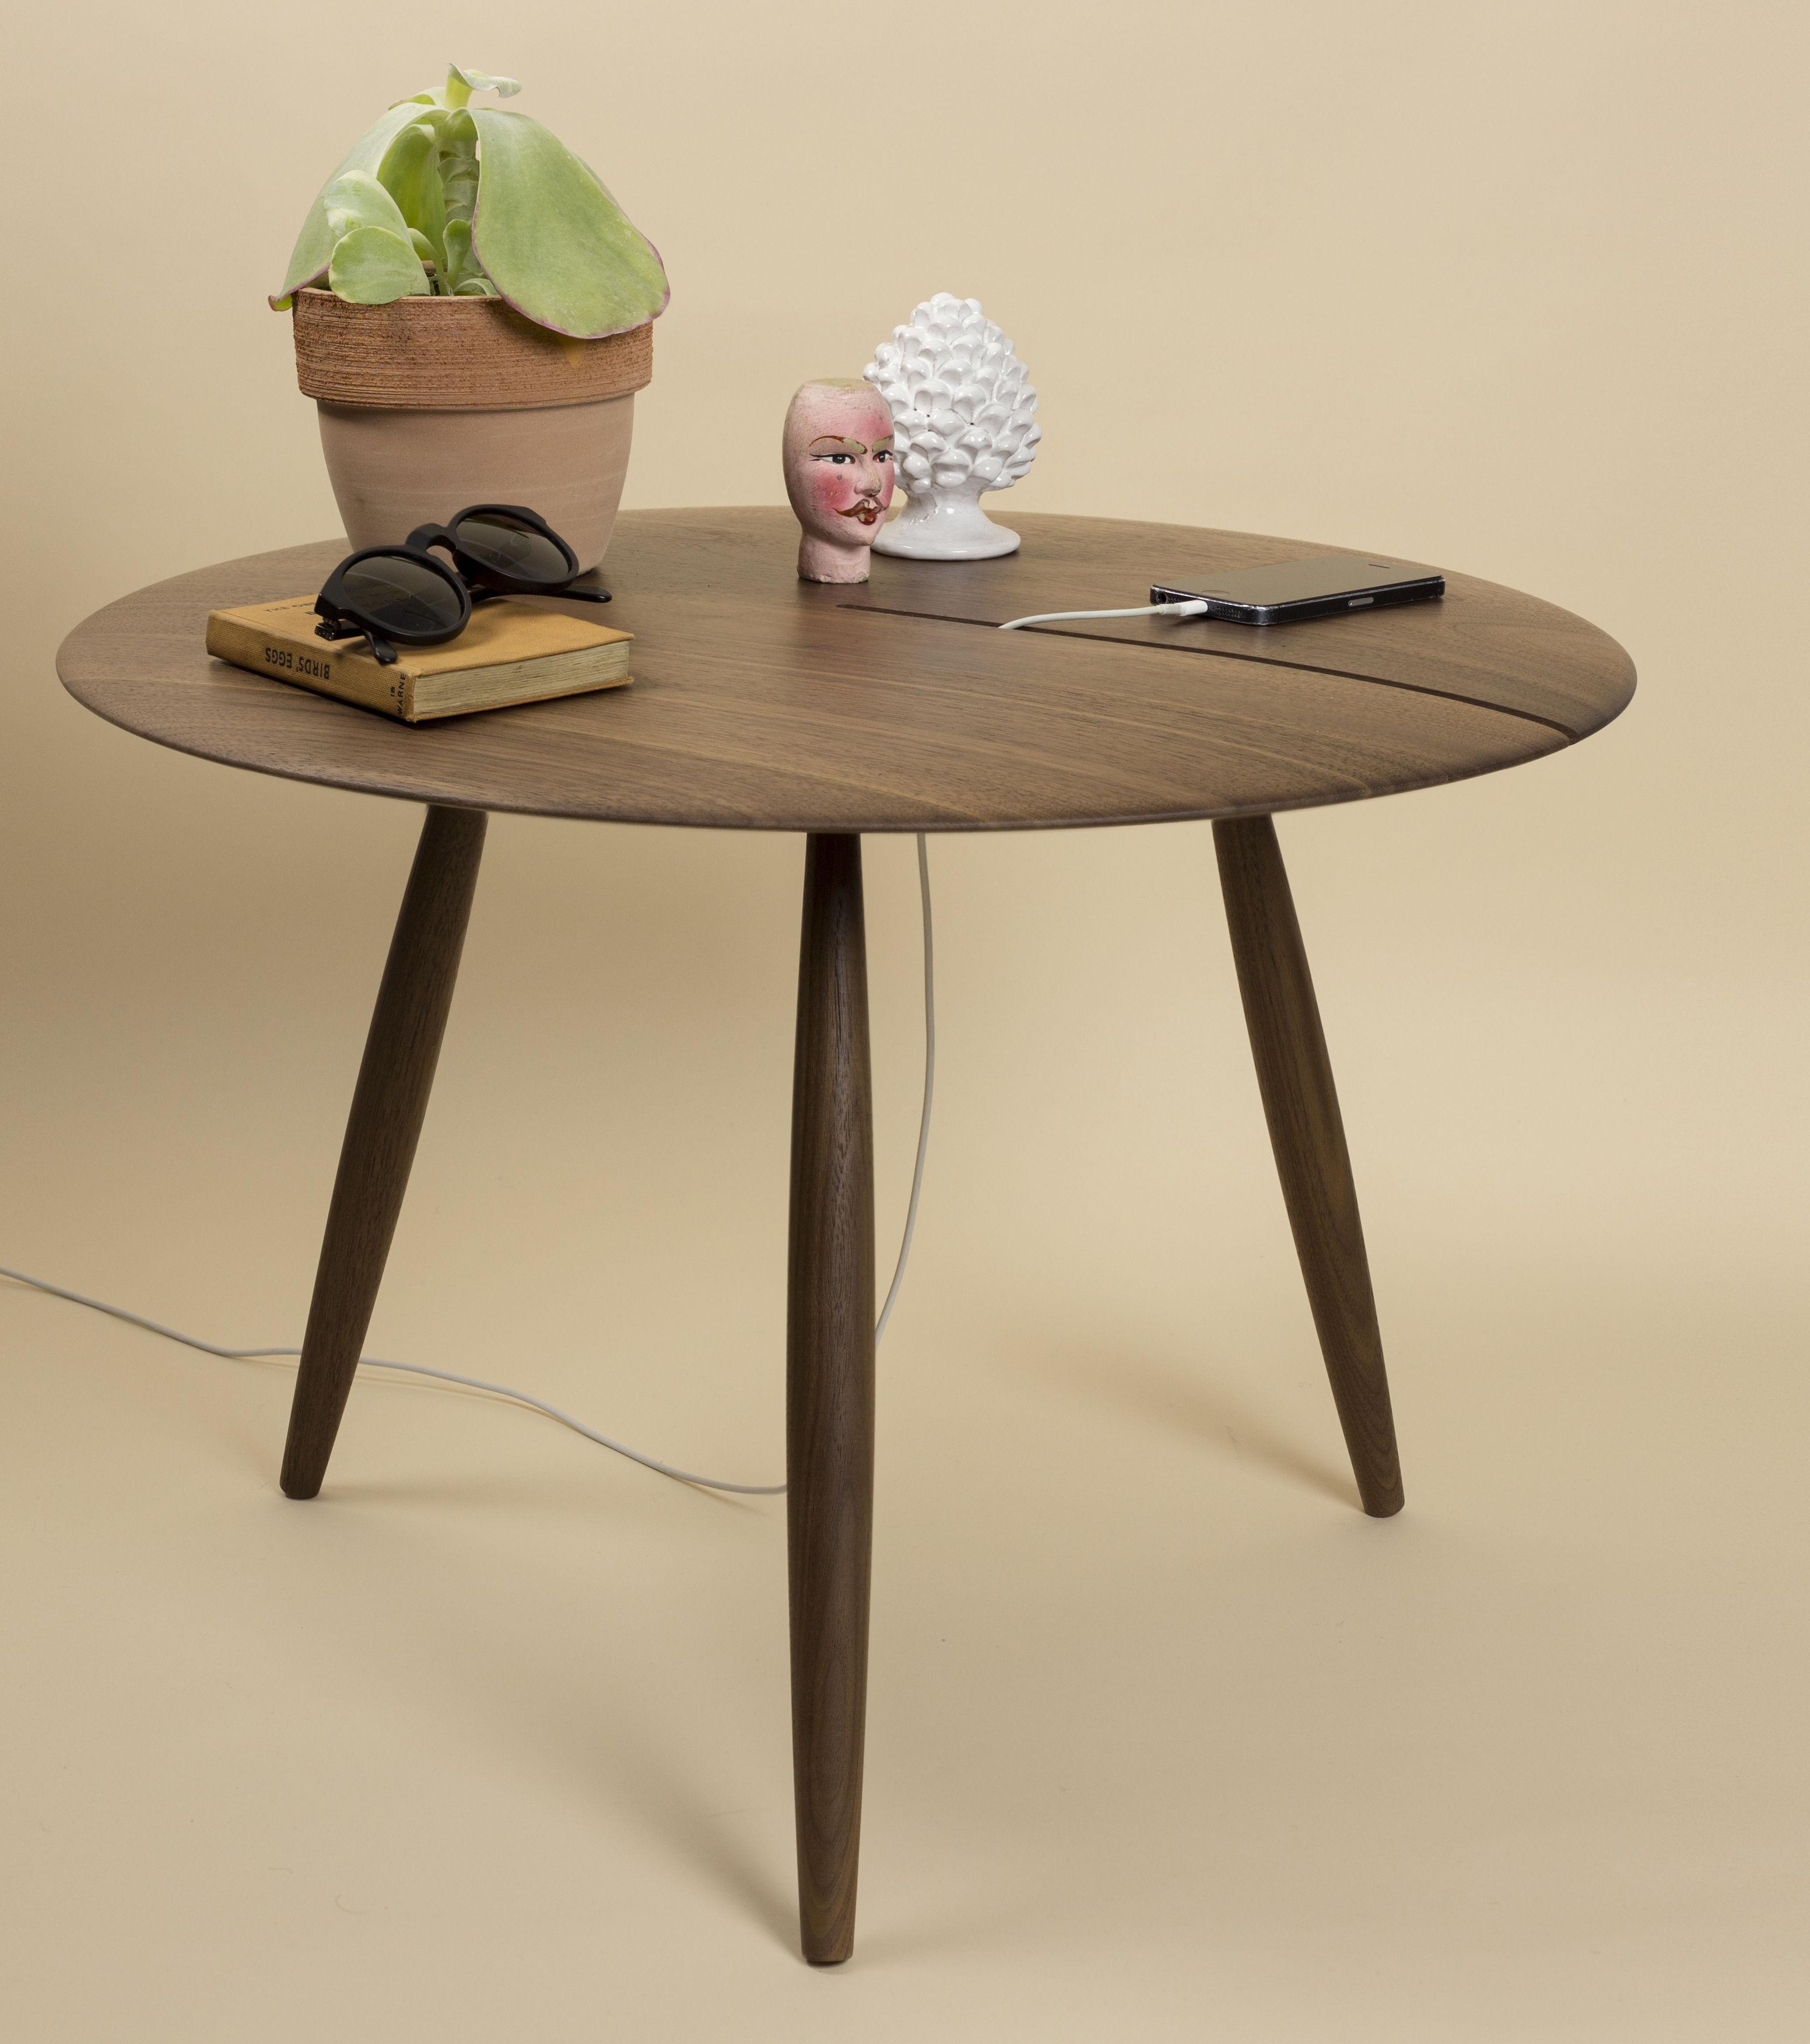 table basse orio 60 cm noyer internoitaliano. Black Bedroom Furniture Sets. Home Design Ideas